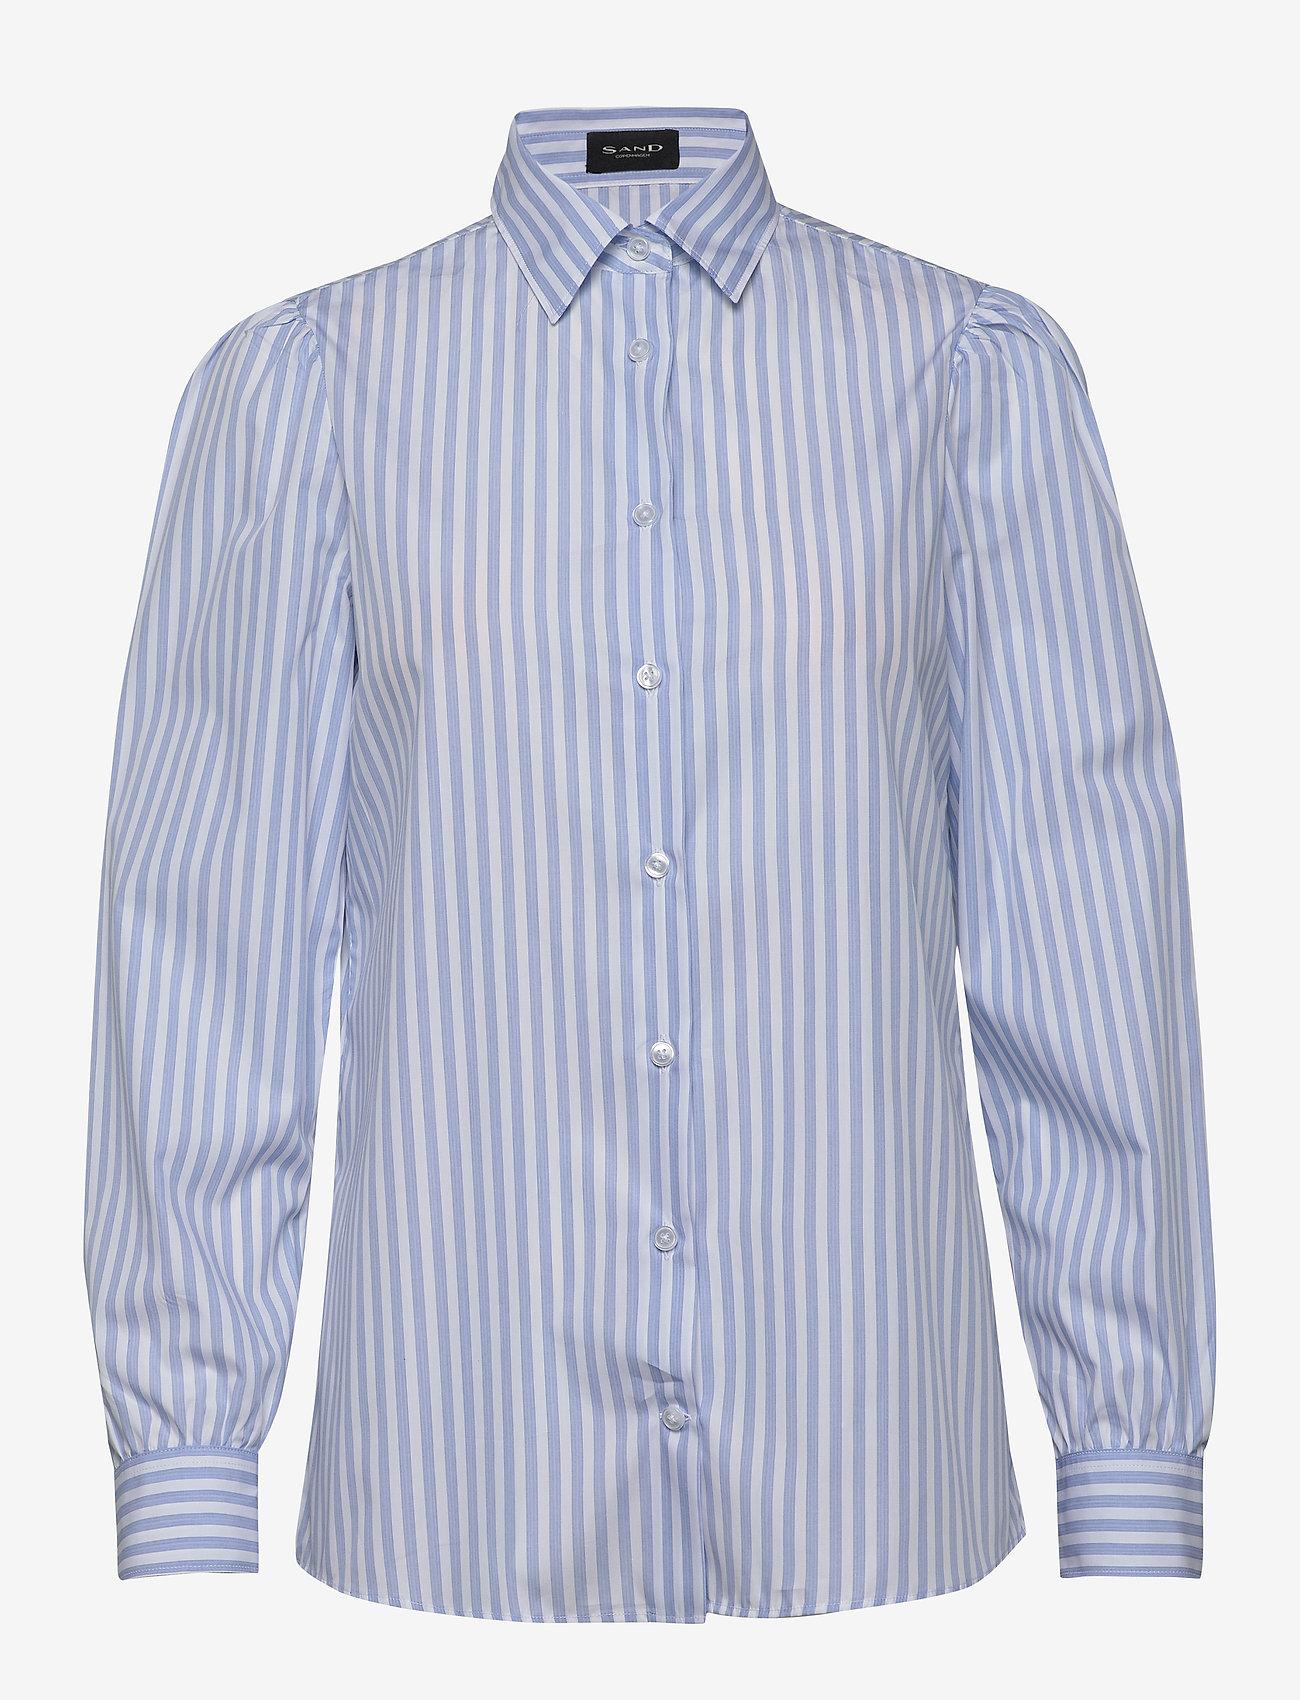 SAND - 8750 - Loreto - chemises à manches longues - ecru/light sand - 0